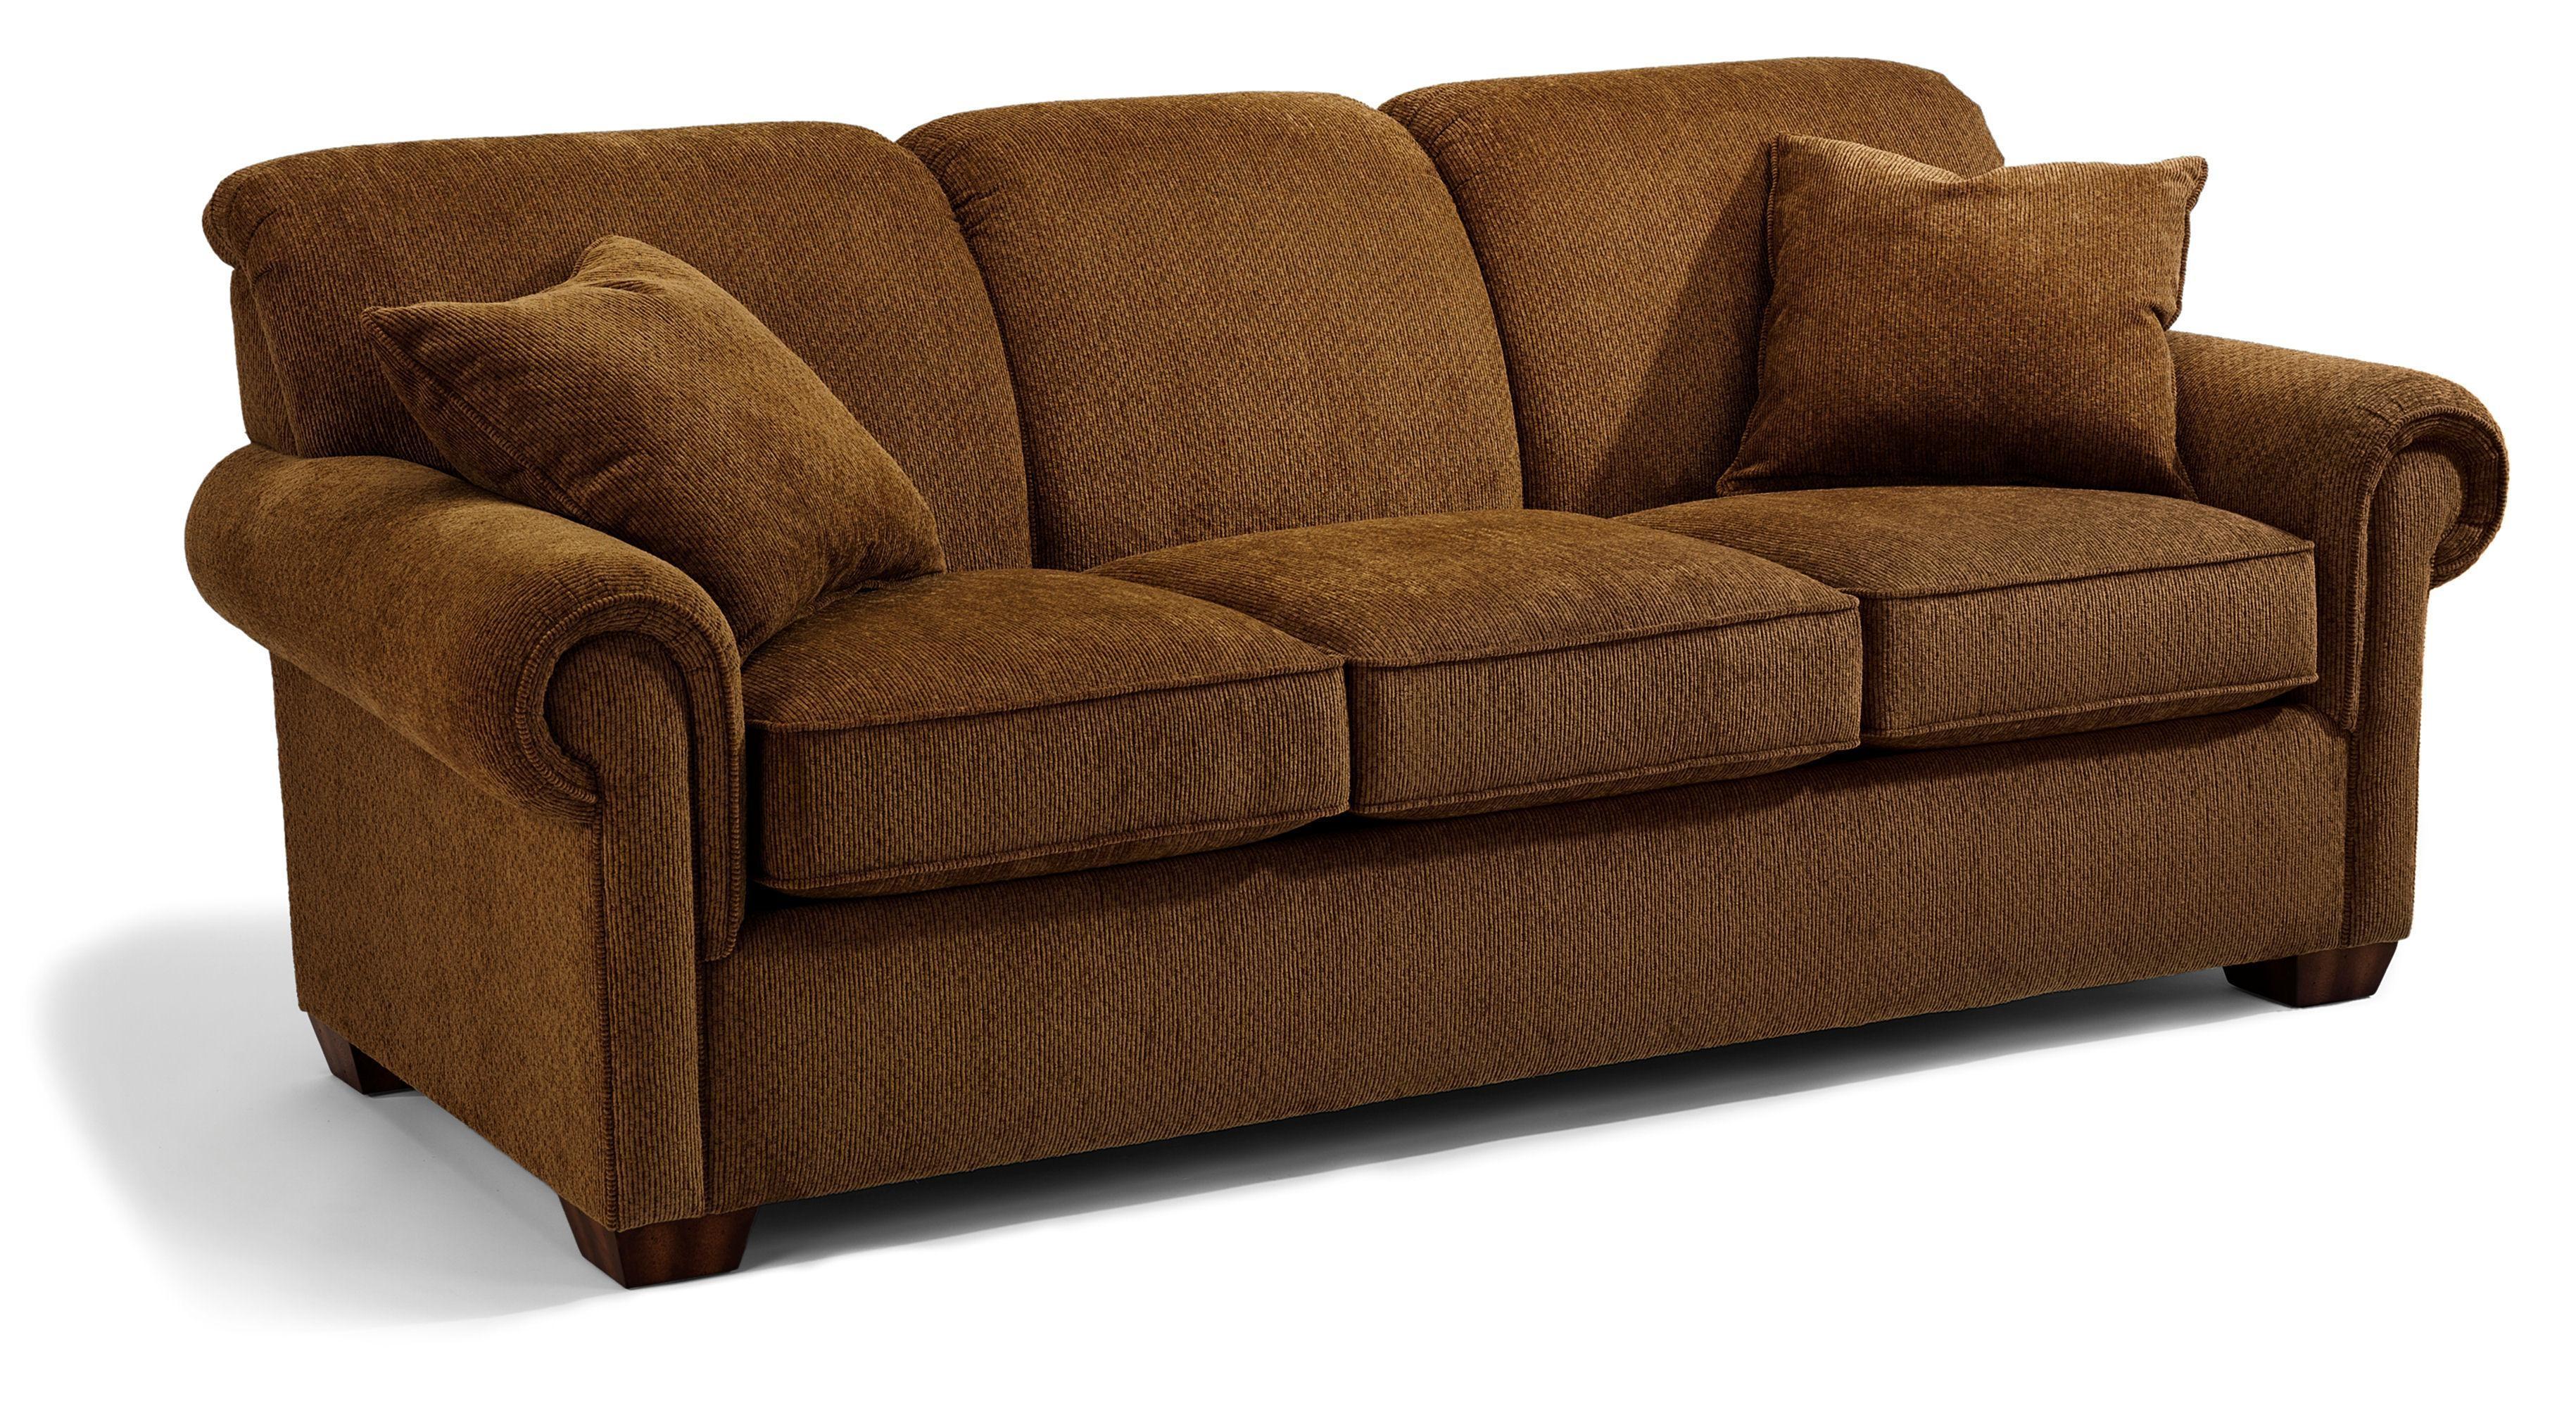 Flexsteel Main Street Rolled Arm Queen Sofa Sleeper – Dunk Throughout Queen Sofa Beds (Image 6 of 20)